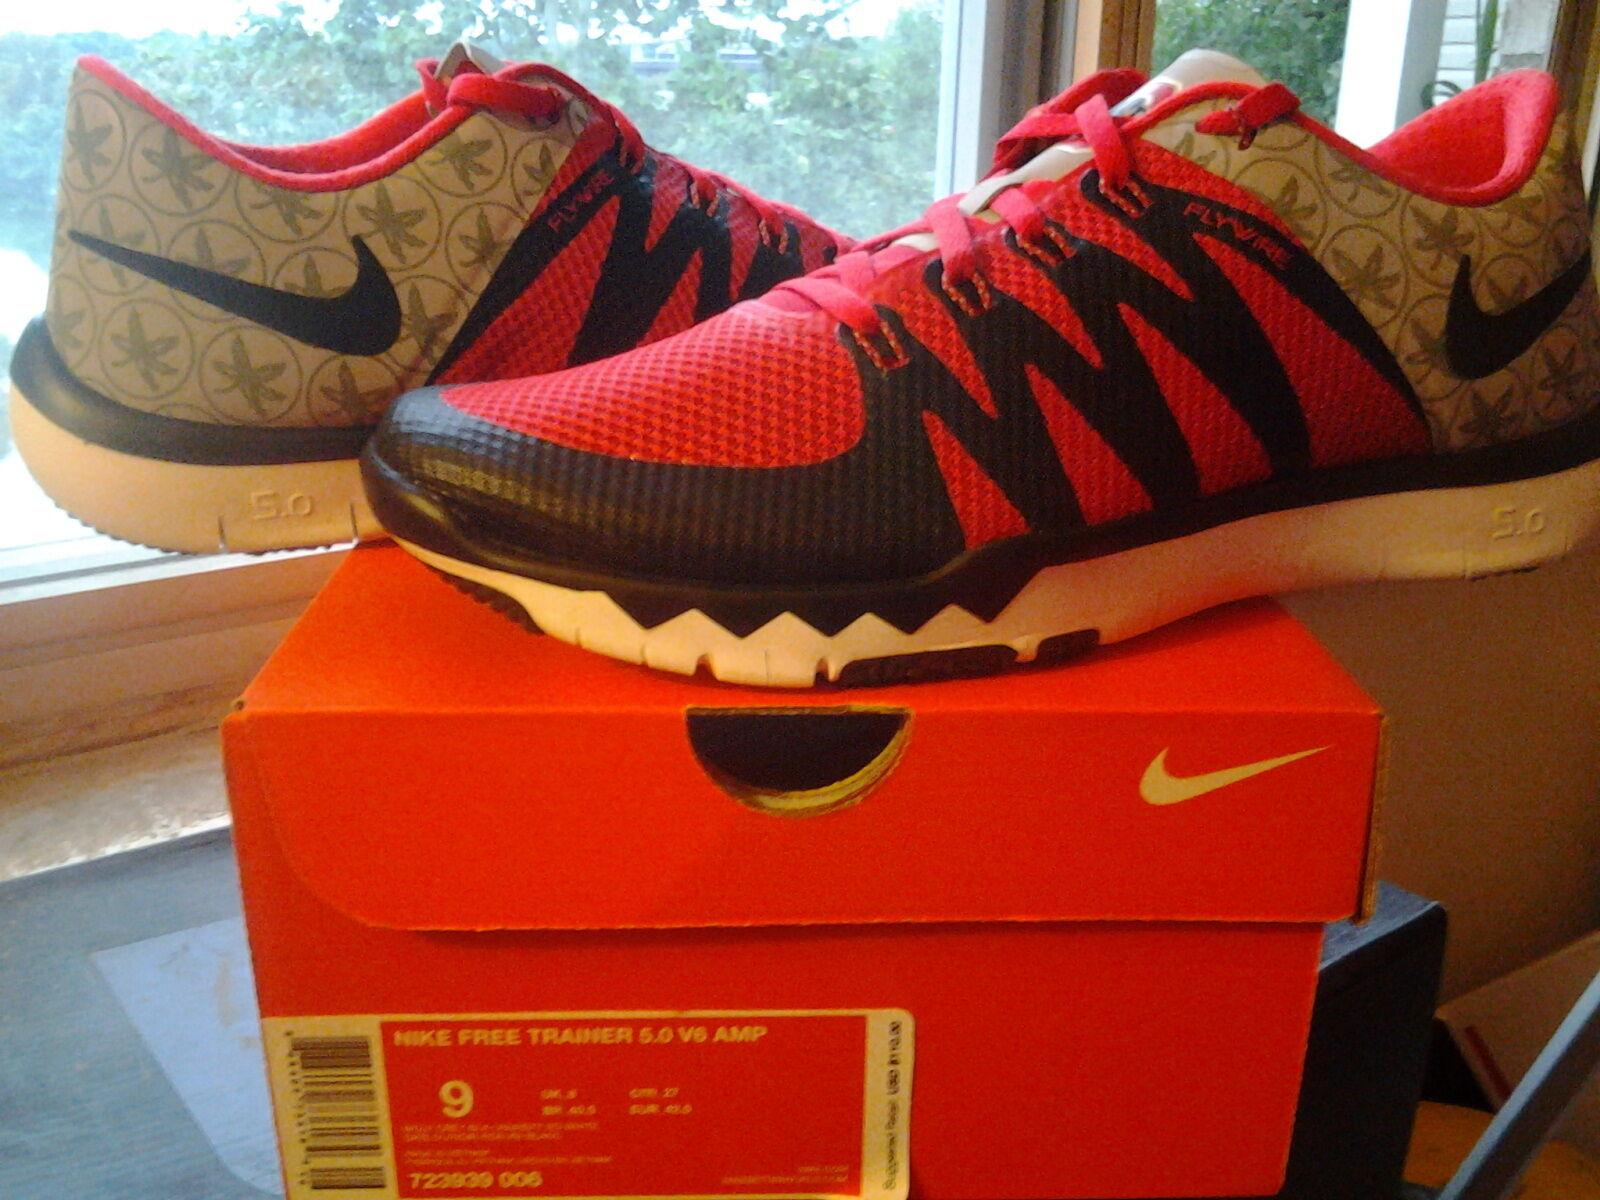 Nike air trainer free 5.0 v6 amp ohio 0 state osu buckeyes woche 0 ohio 0 723939 006 759f99